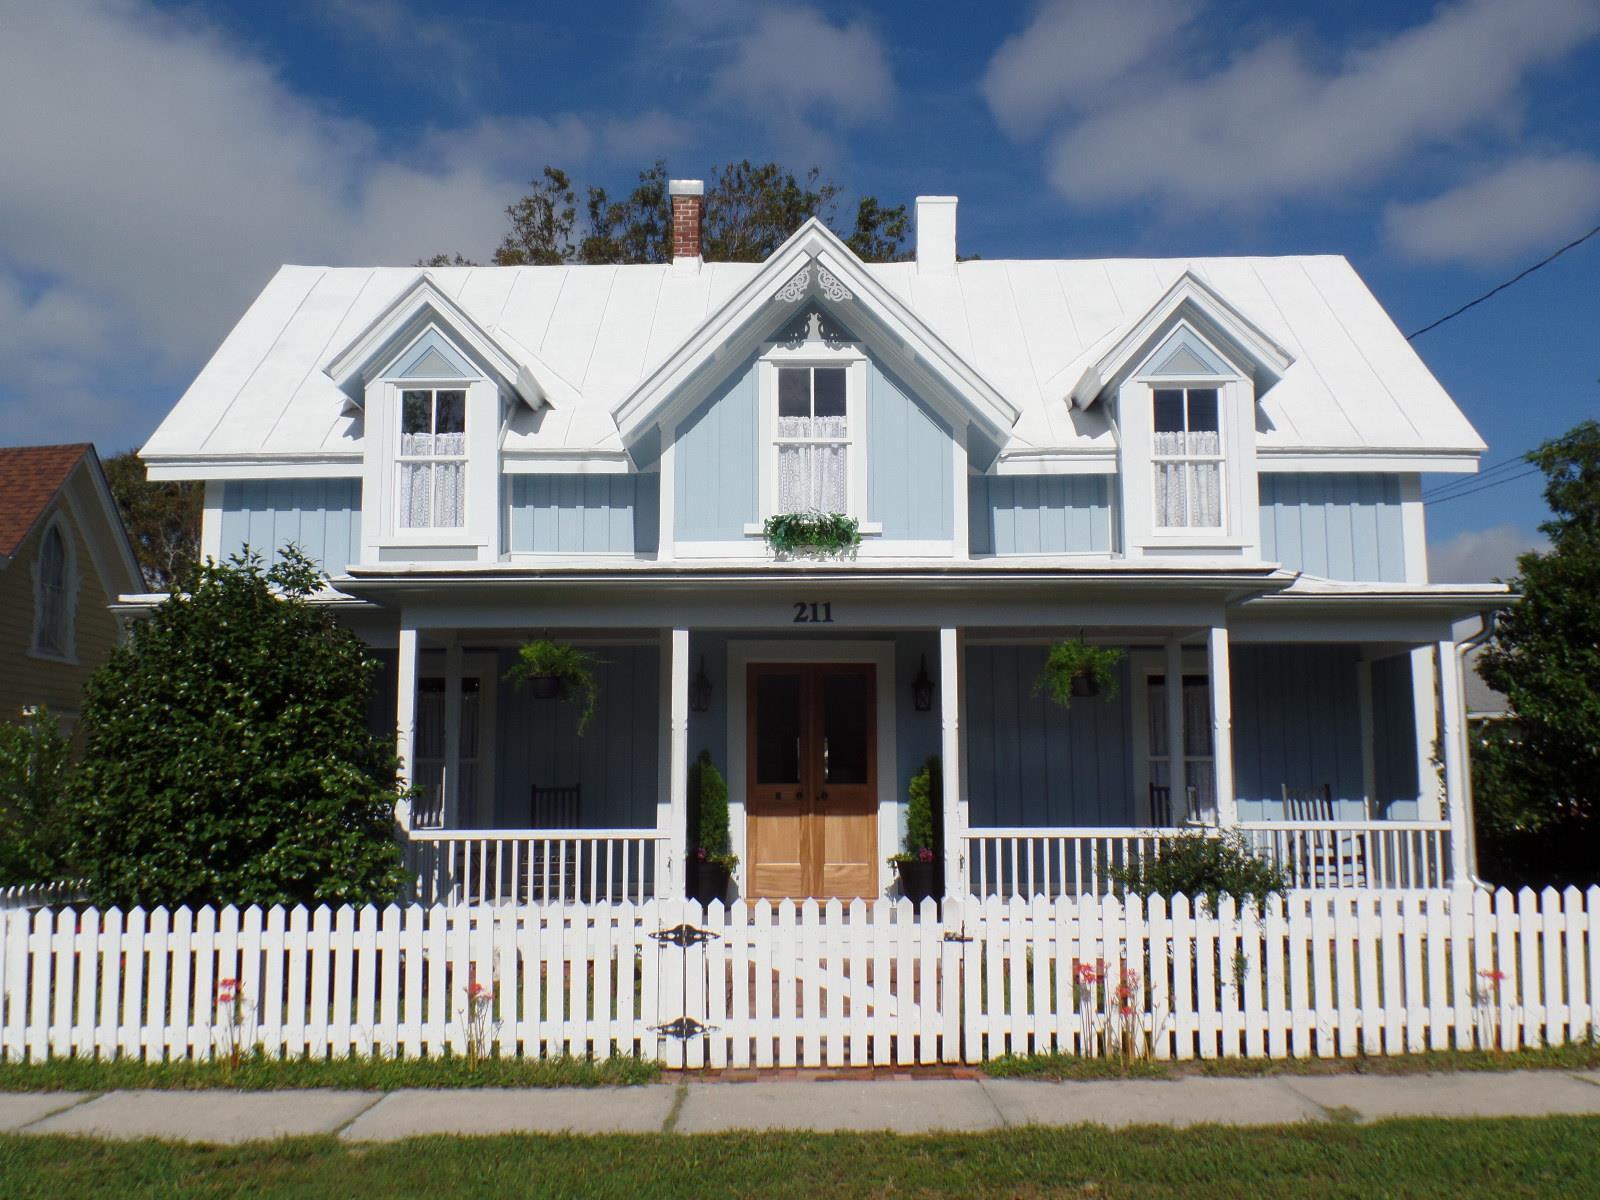 The Admiral's house, Beaufort, NC Built circa 1883.